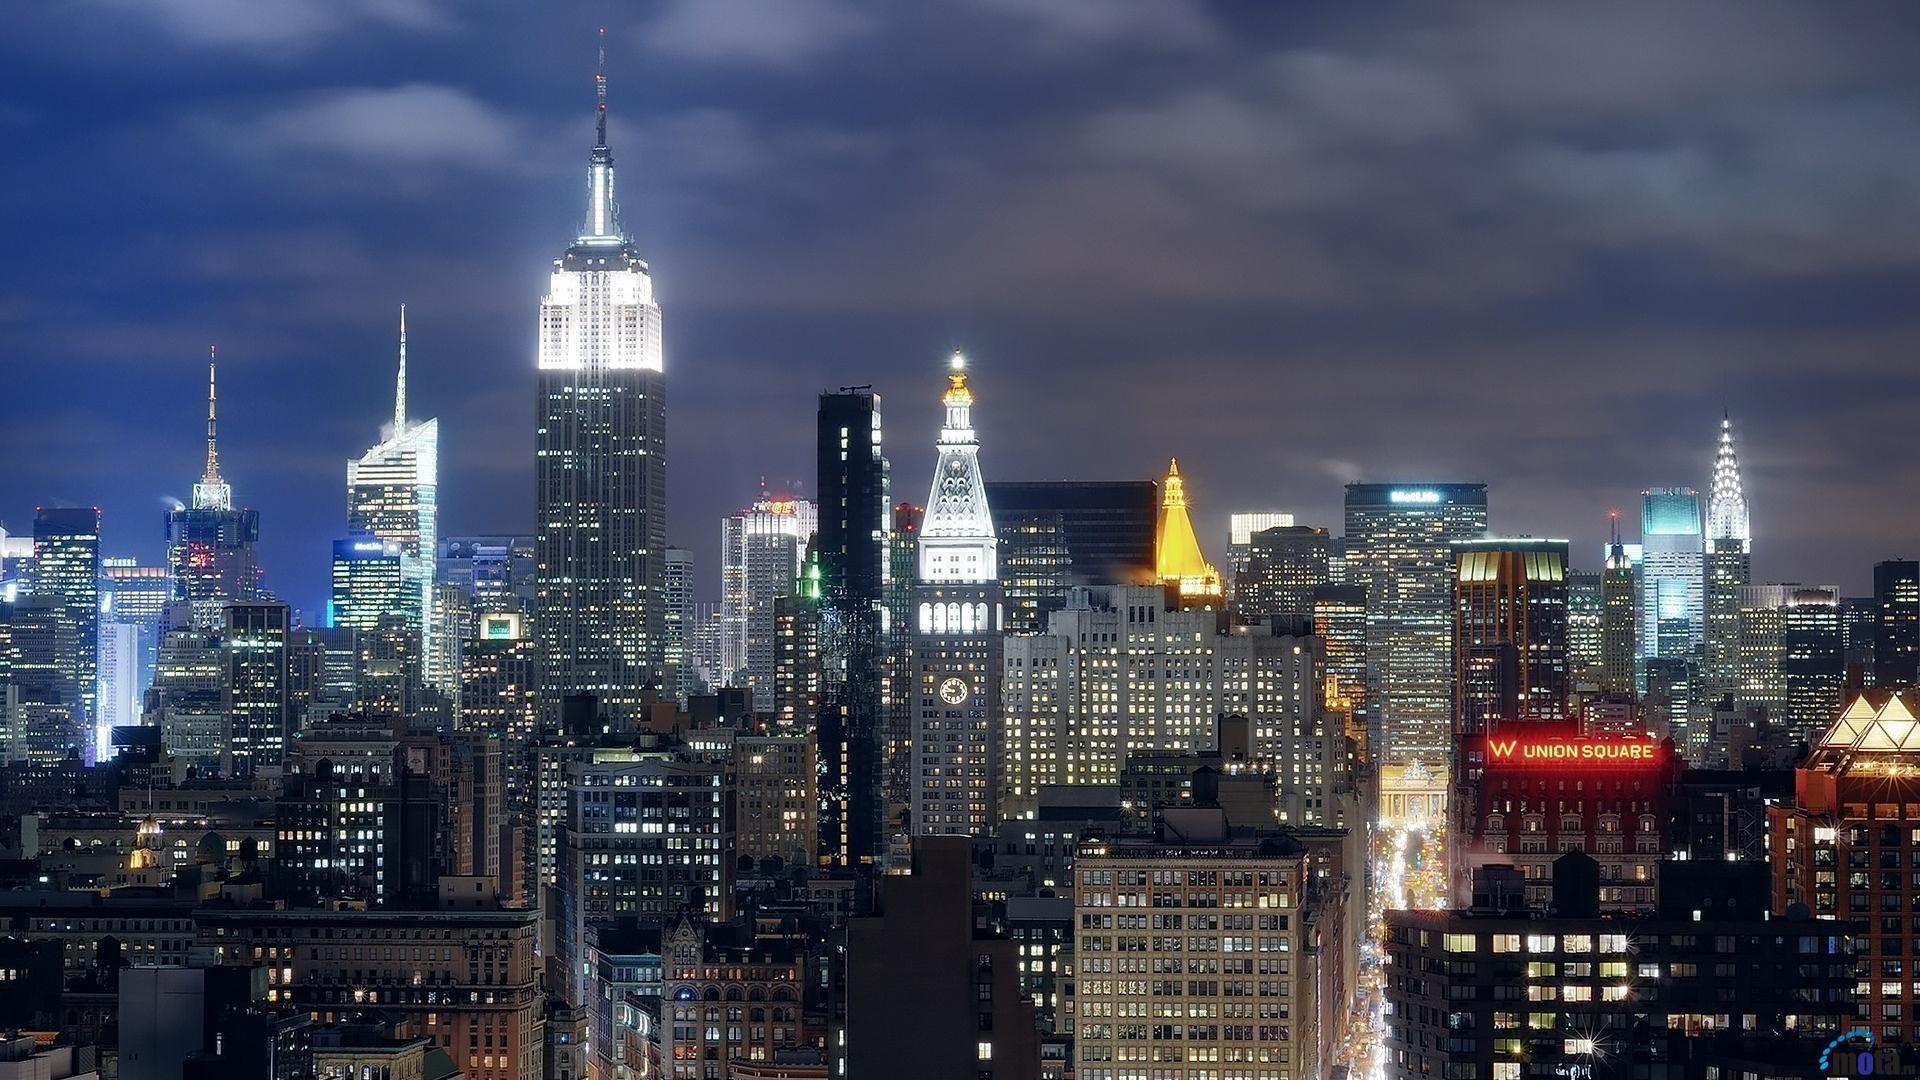 Pin By Kristi Hutton On New York City Nyc At Night New York Hotels Manhattan New York